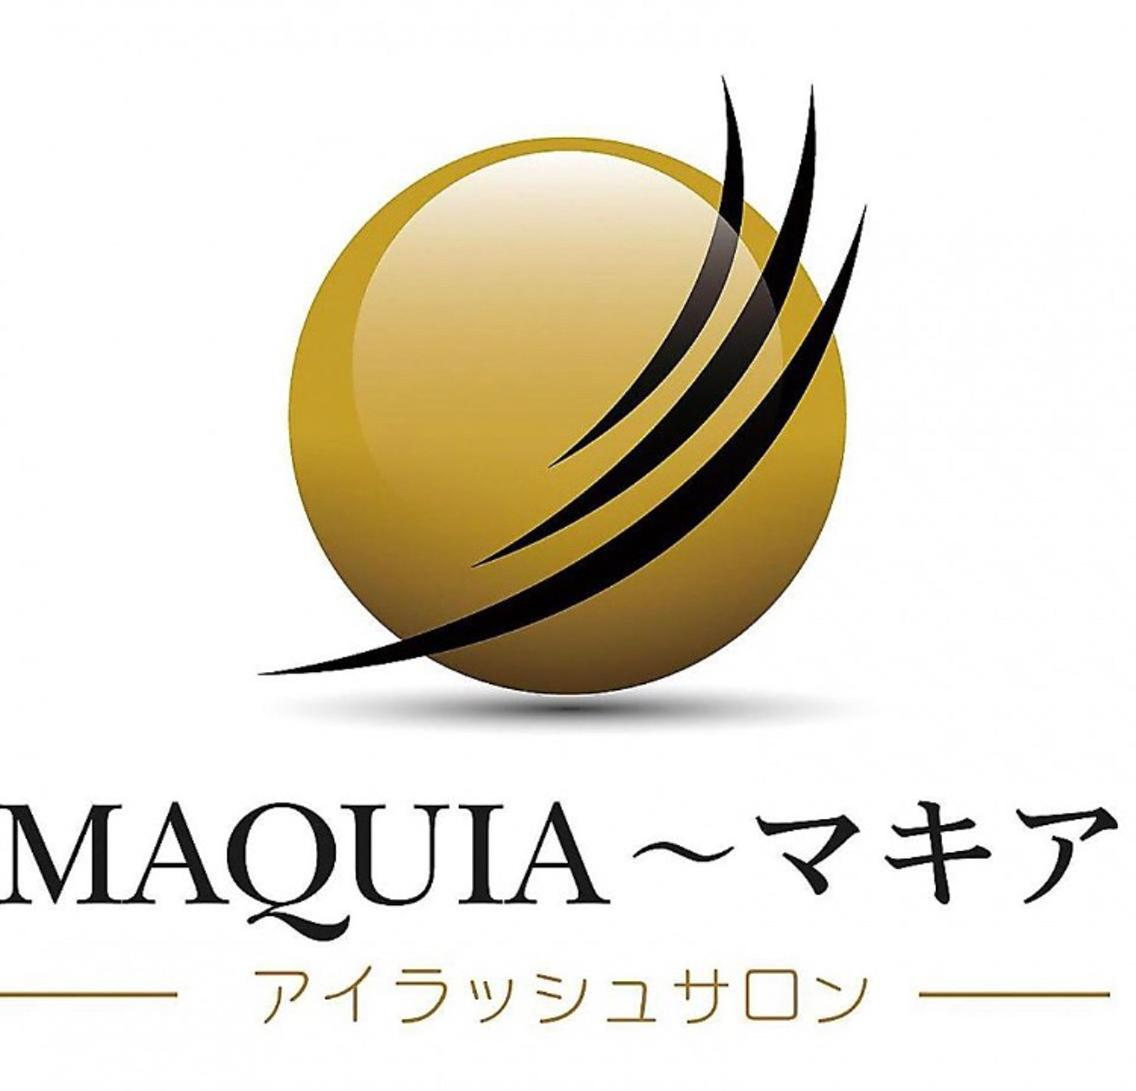 MAQUIA所属・MAQUIA京都駅前 山崎の掲載